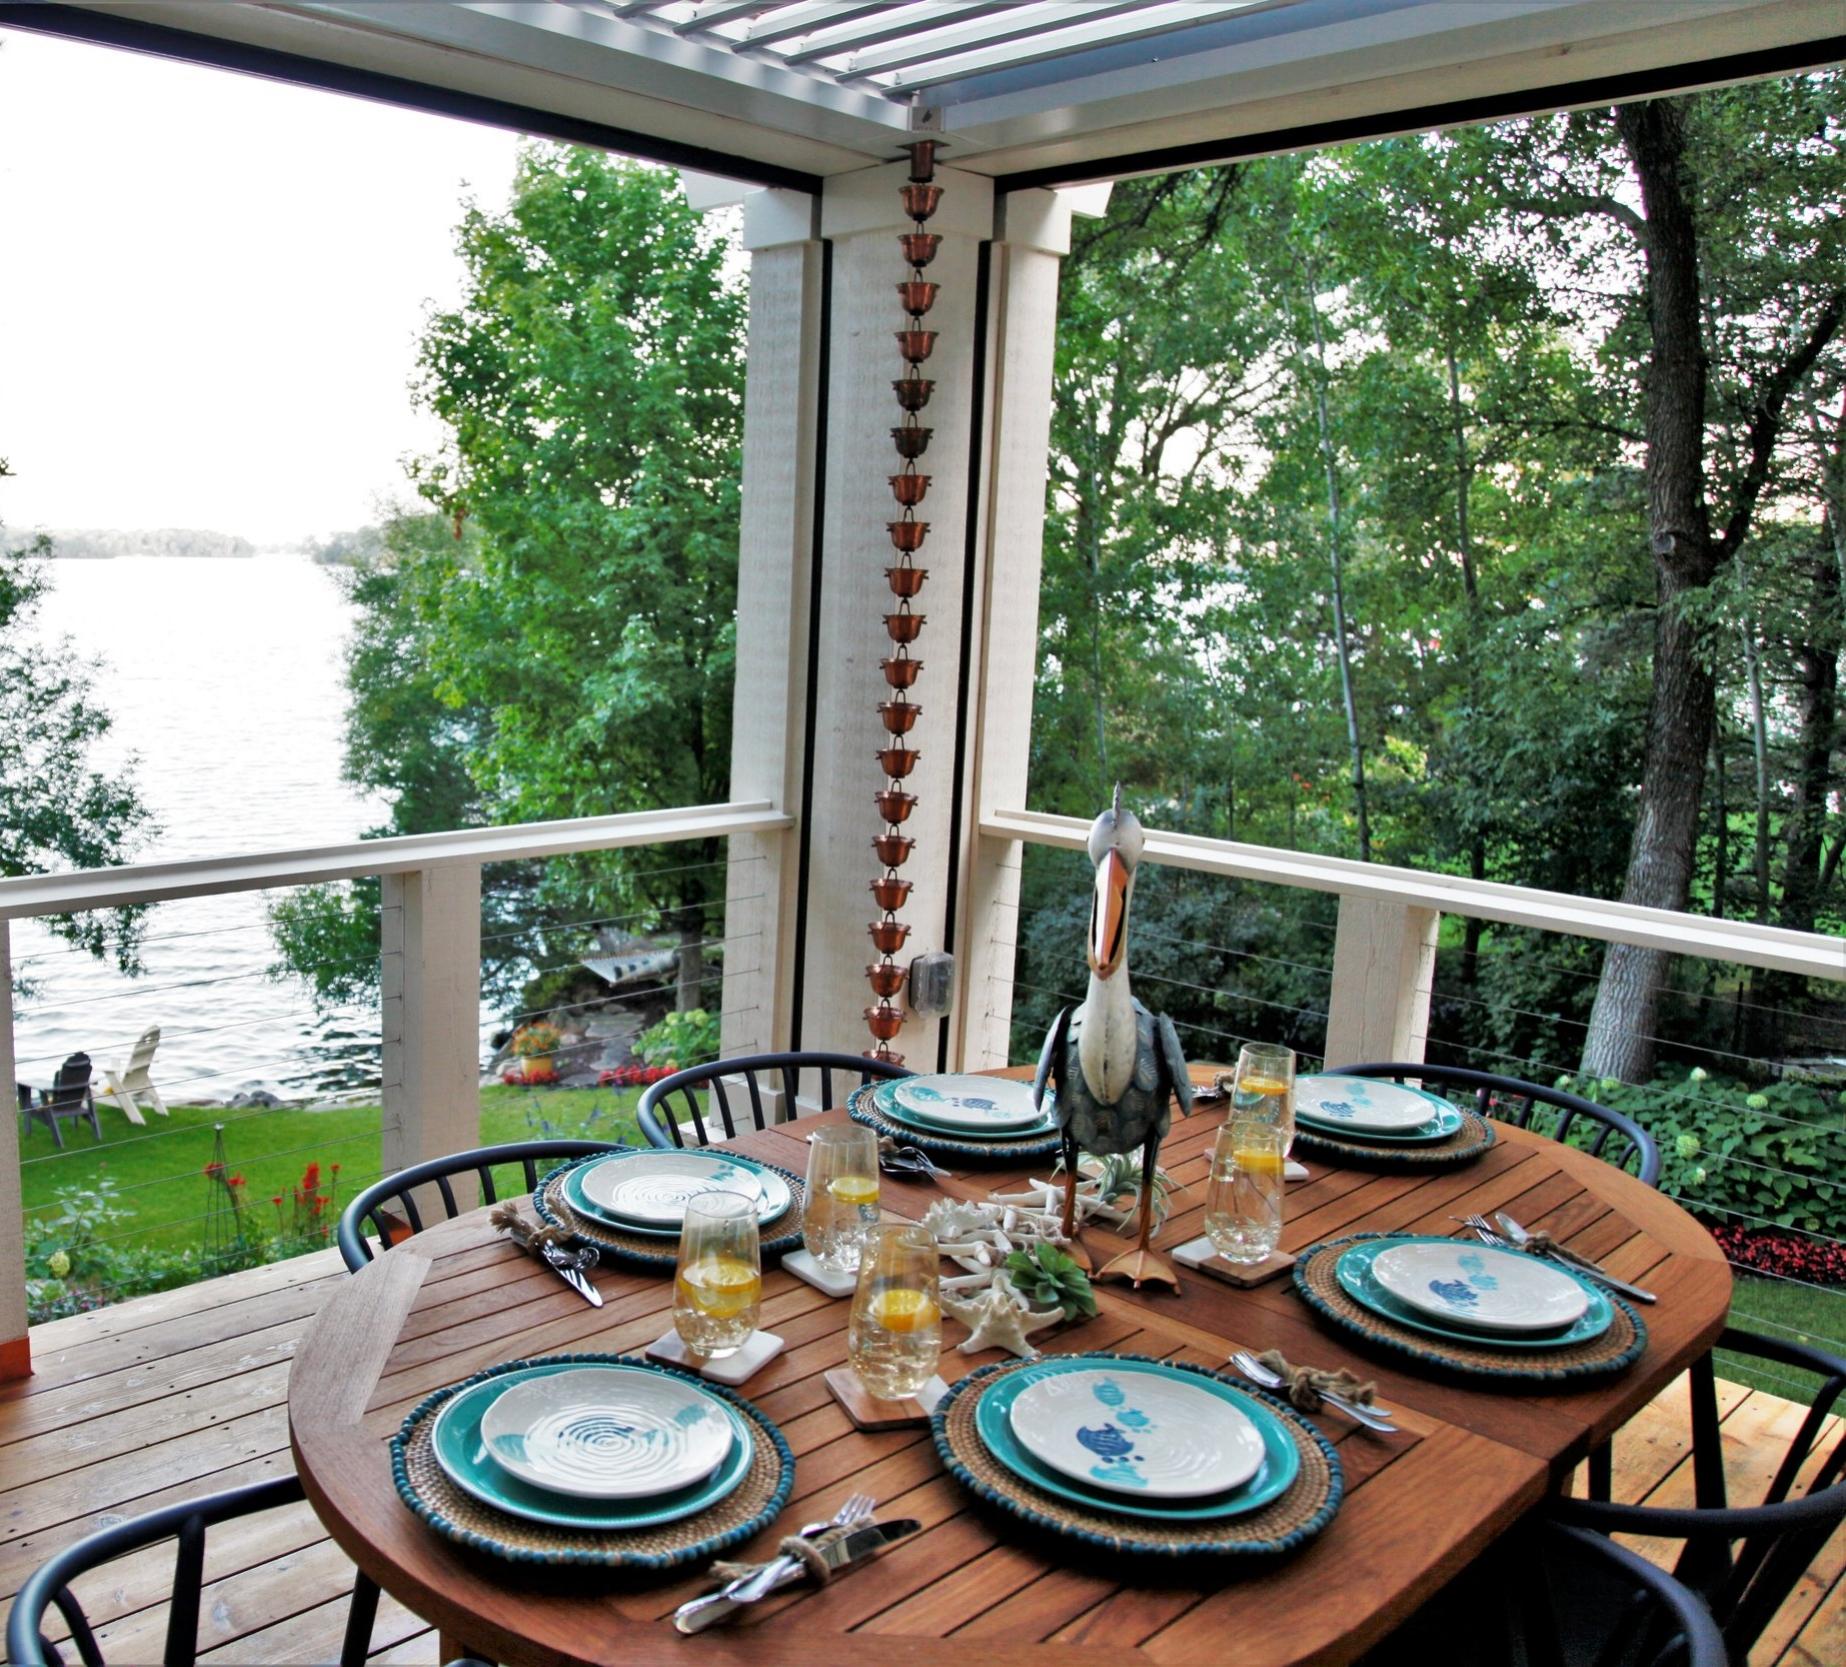 Mom's Design Build - Backyard Outdoor Dining Table